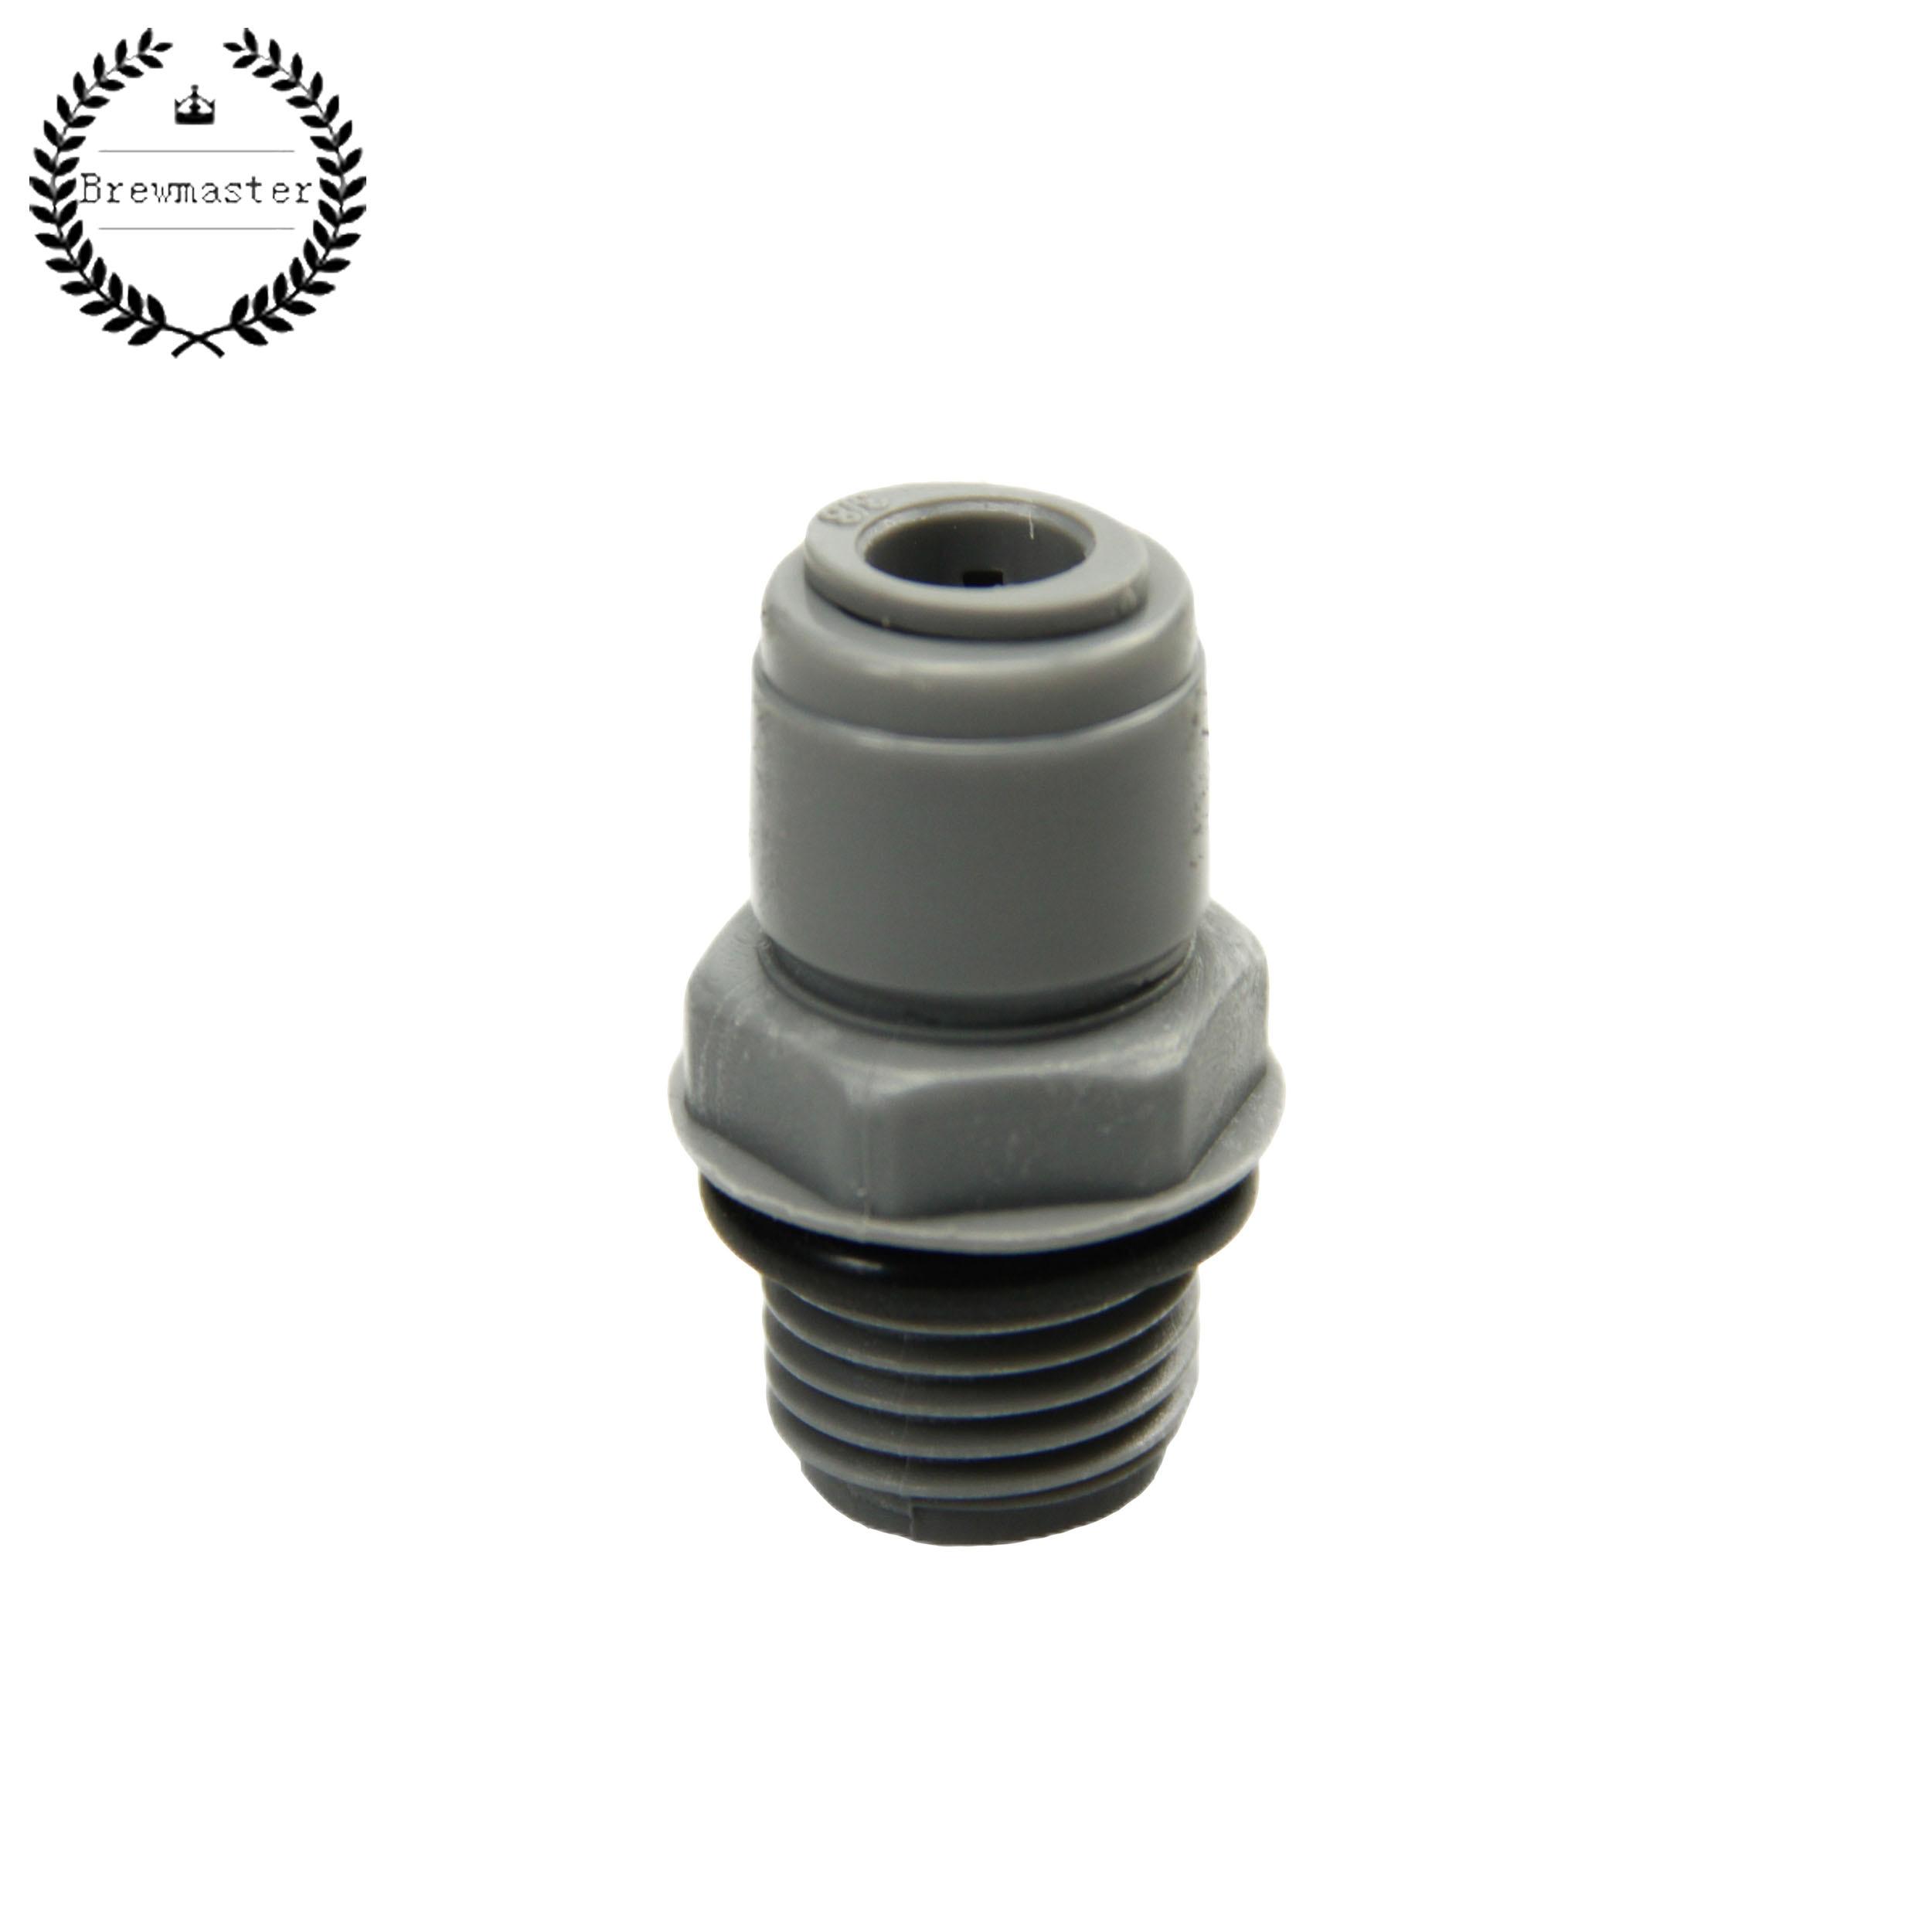 Duotight-9.5mm(3/8) Bulkhead-1/2inch